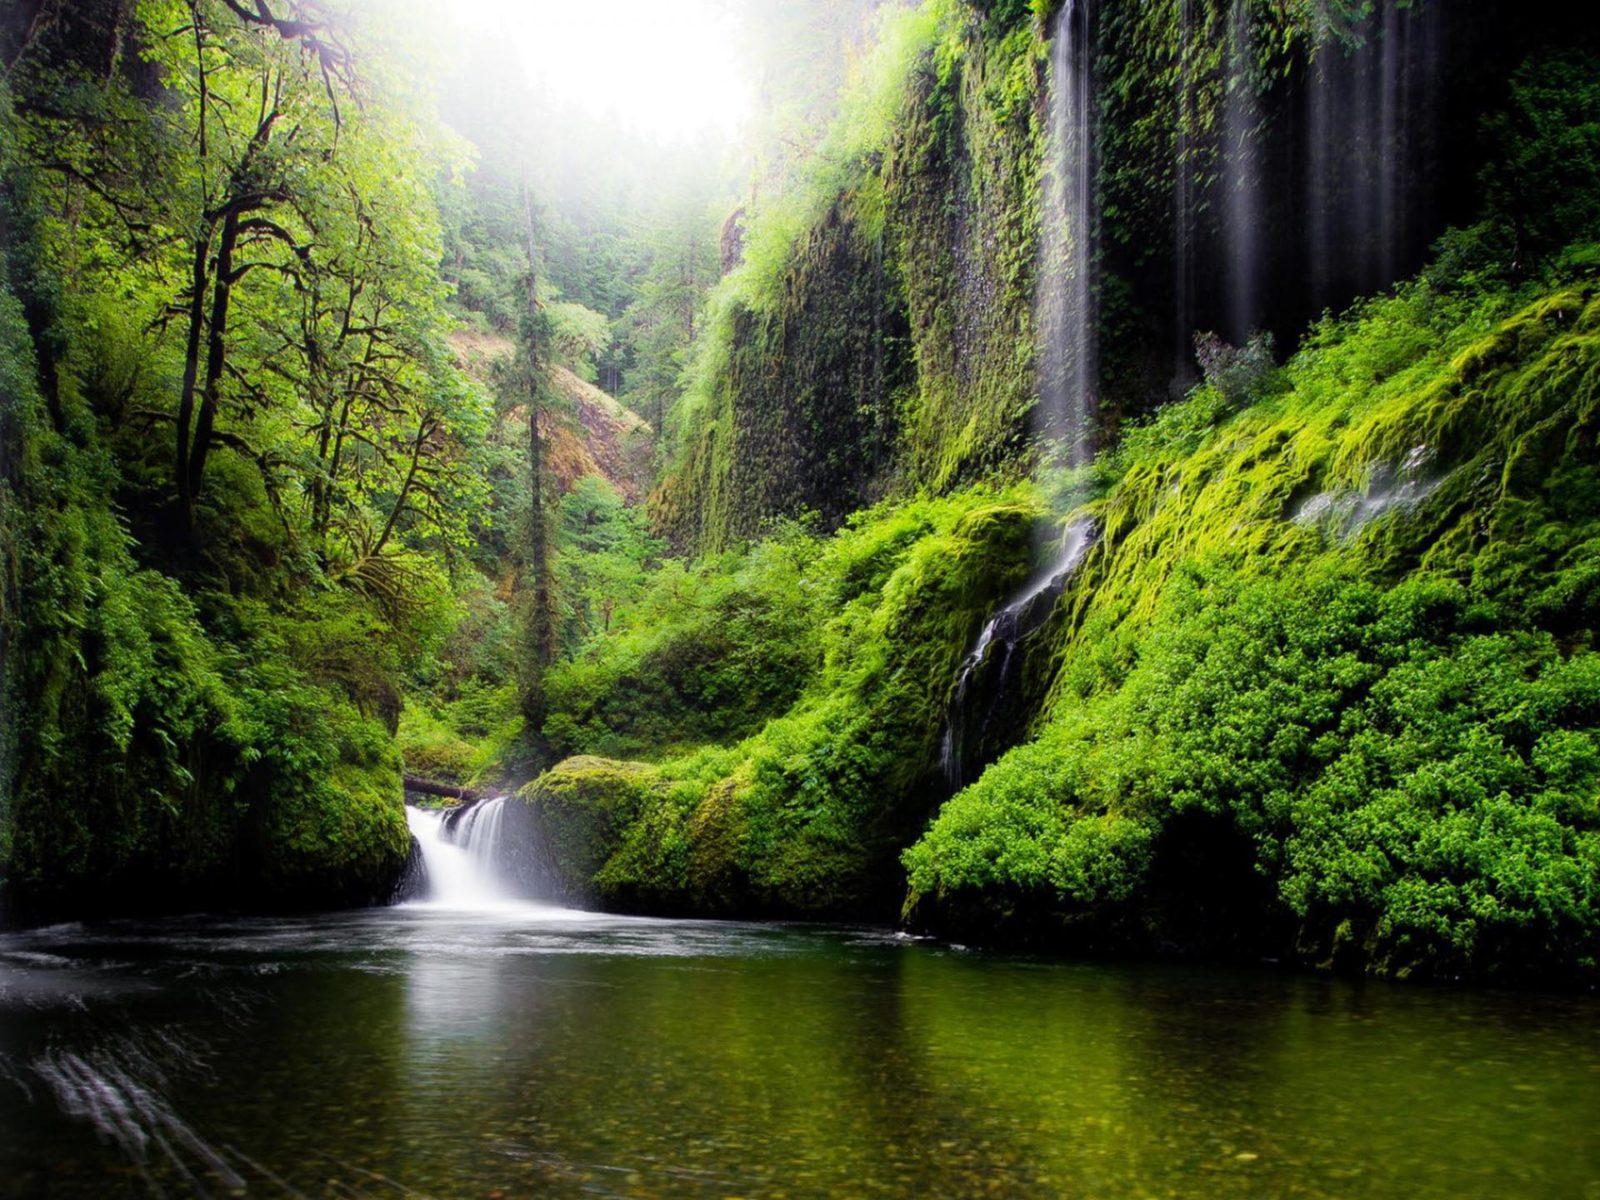 Niagara Falls Wallpaper For Desktop Spring Landscape Waterfall In Oregon Usa Nature River